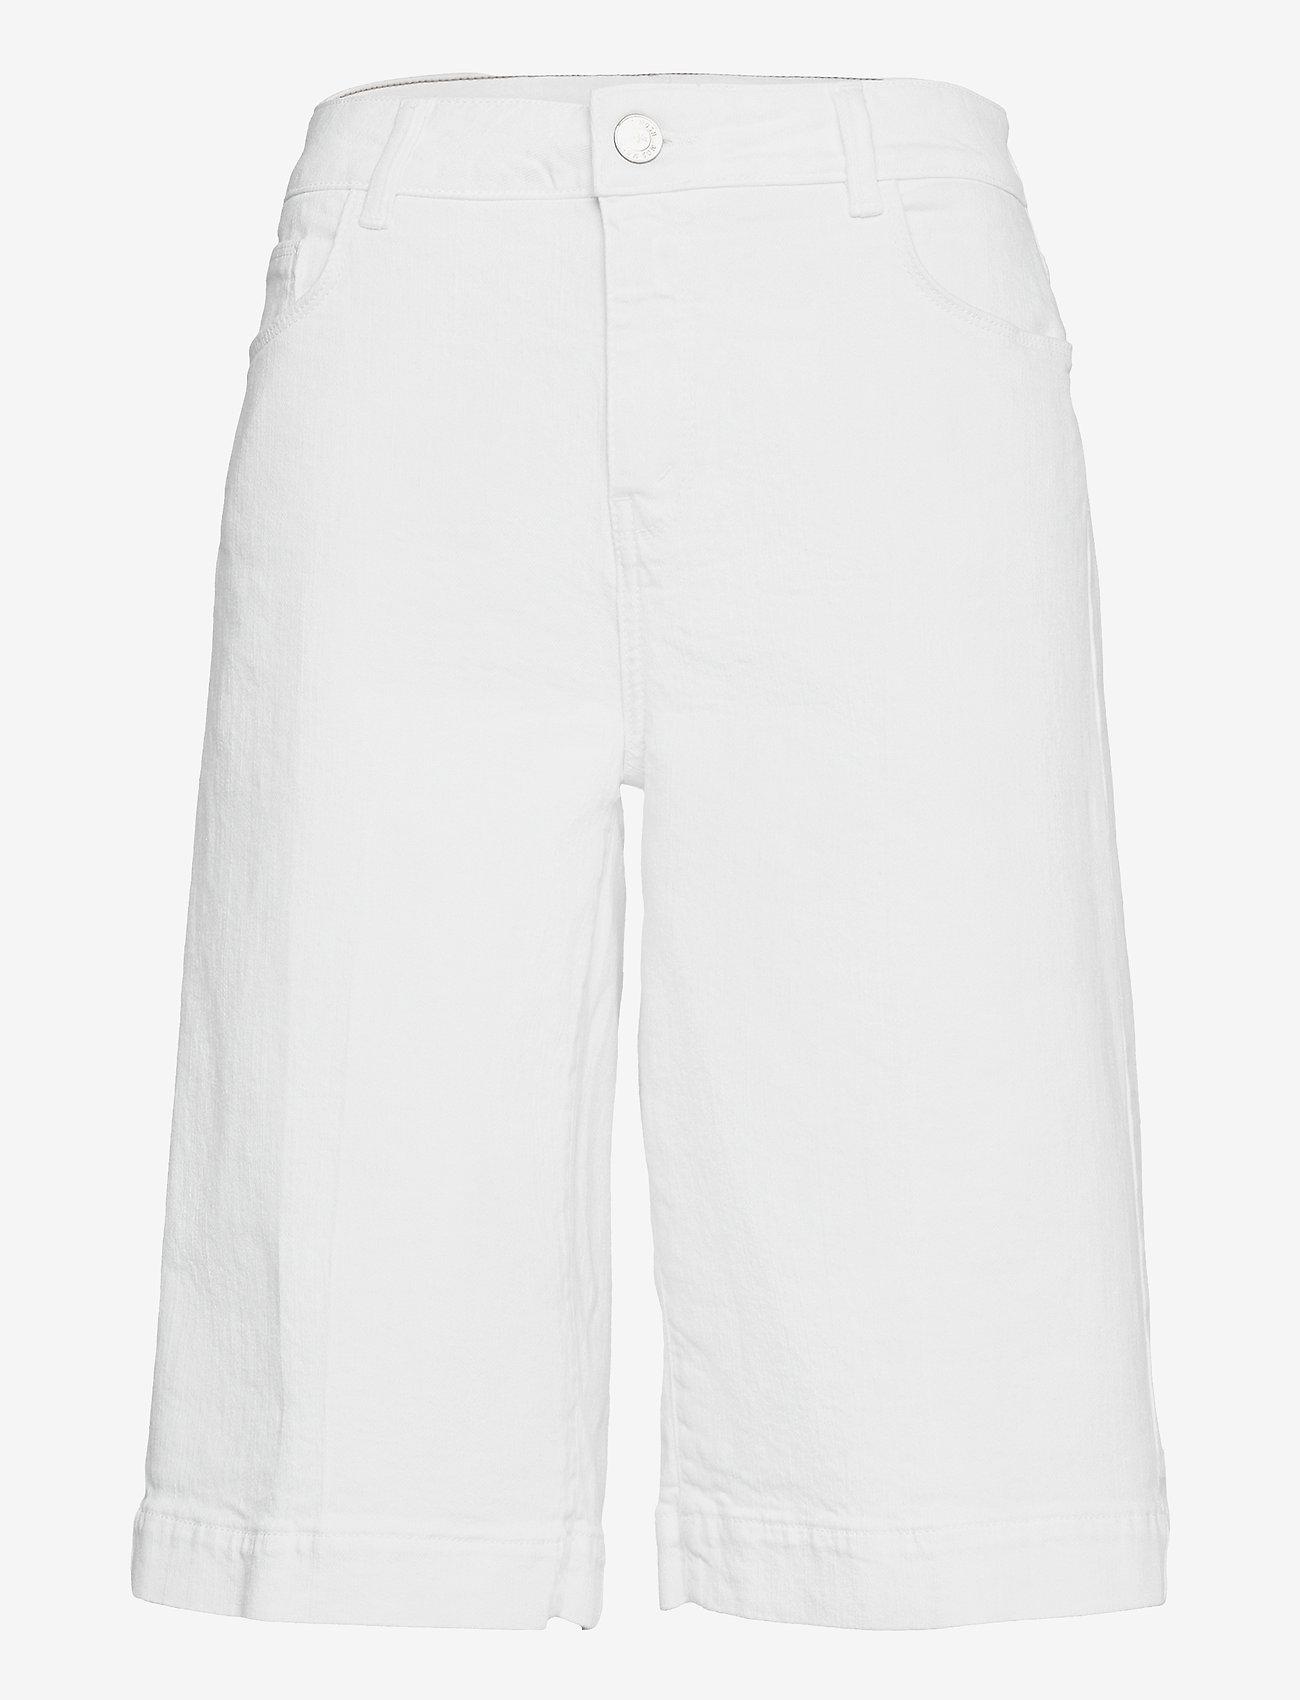 MOS MOSH - Zoe White Skirt Short - bermudas - white - 0